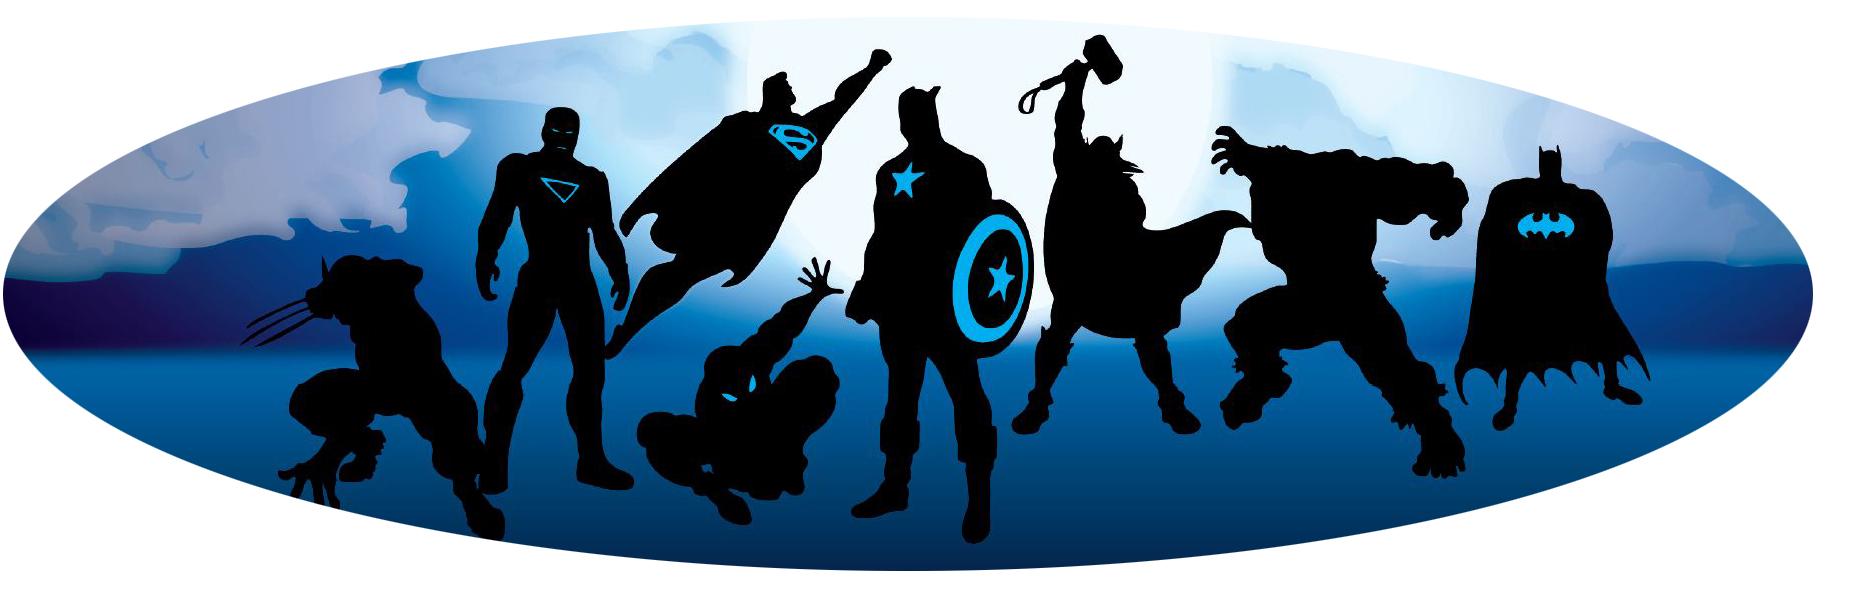 Superhero silhouette banner oval